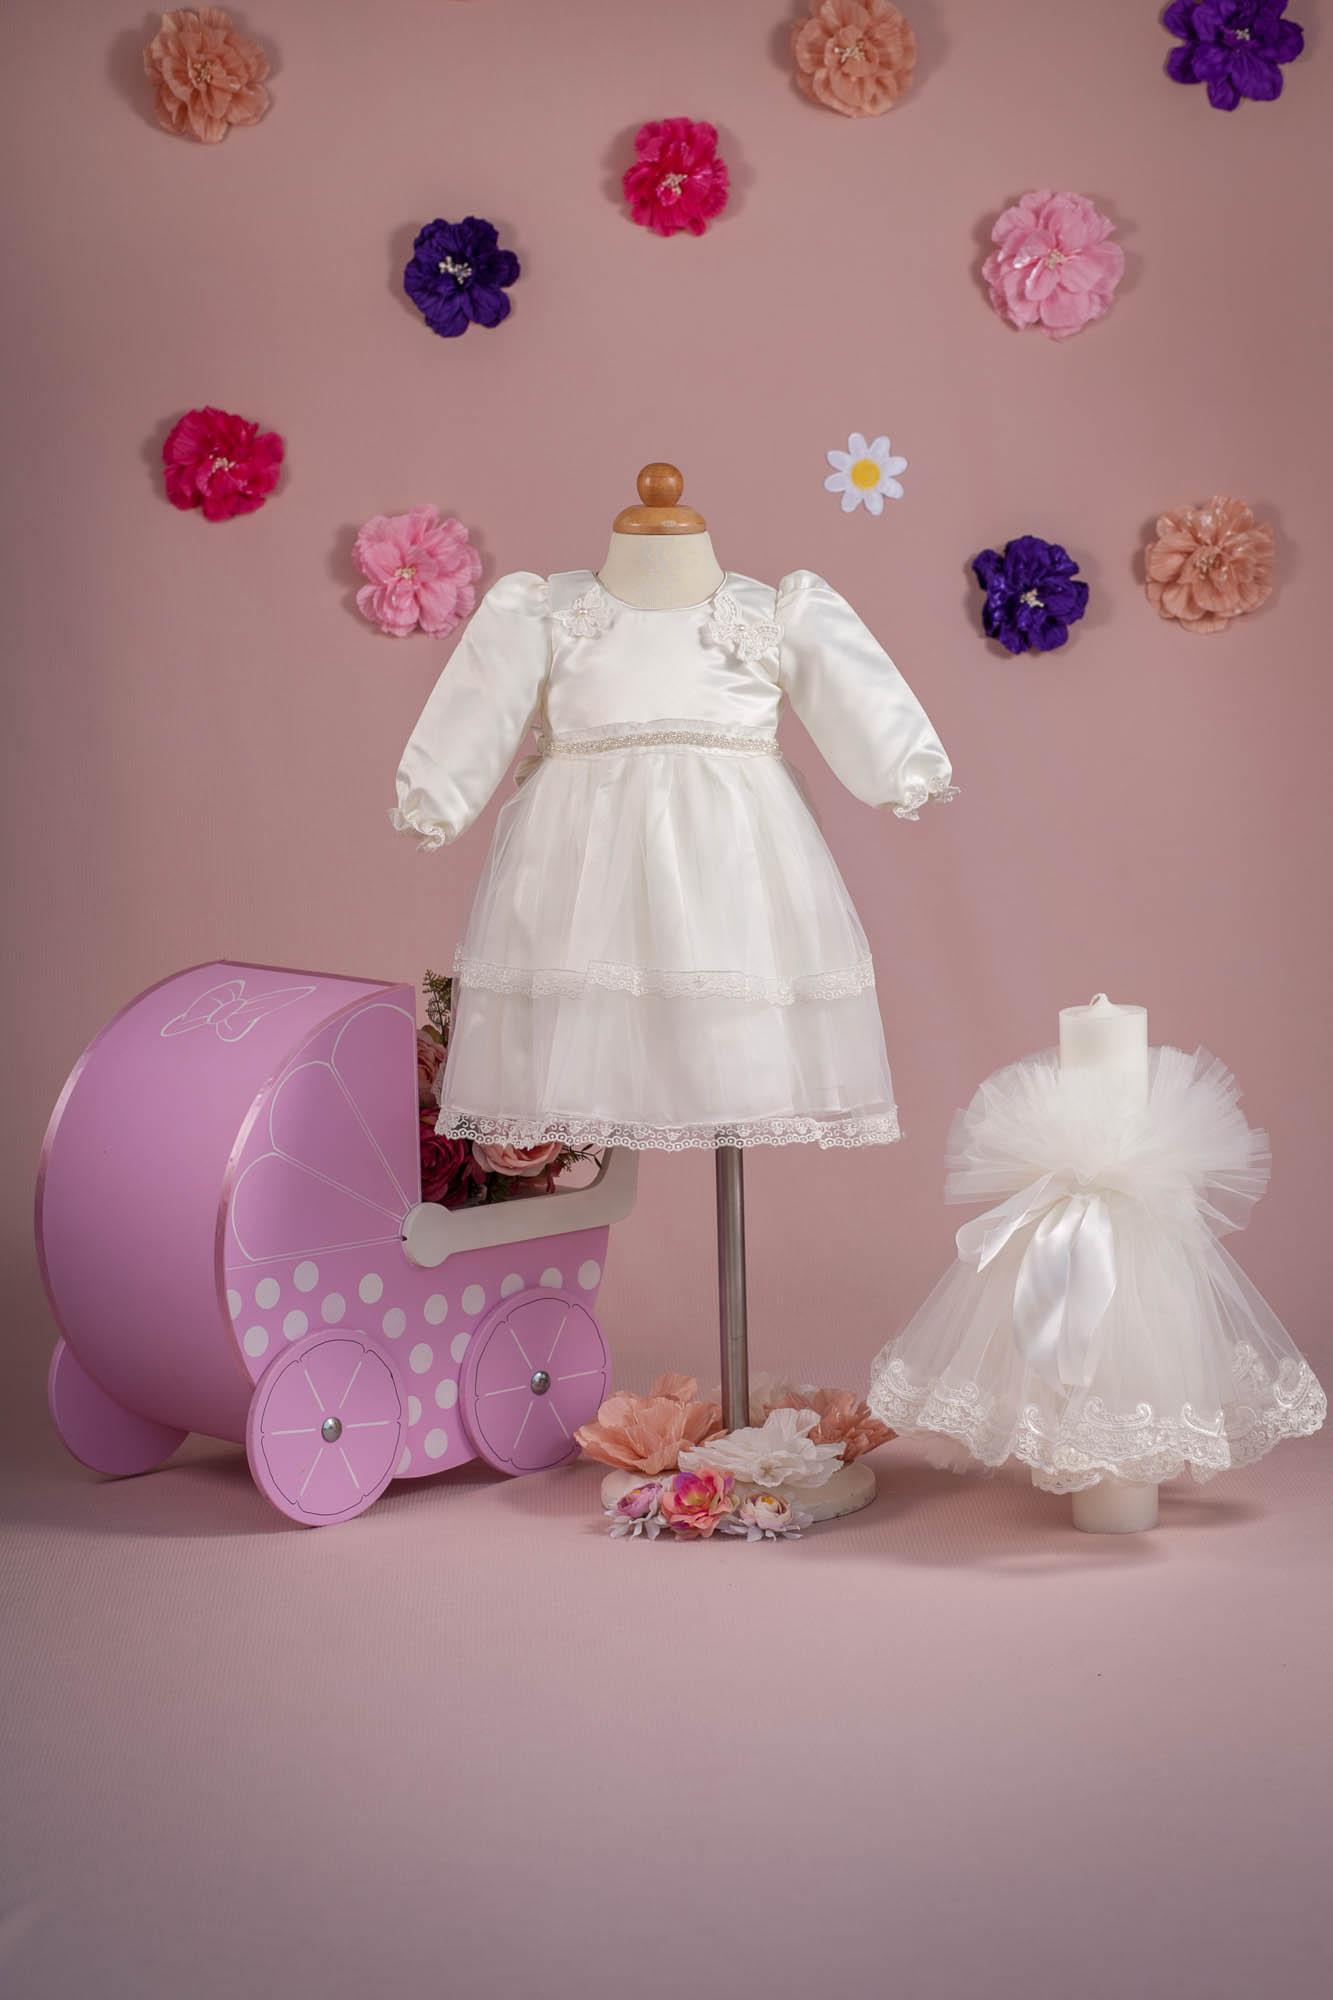 Rochita White Baby 1